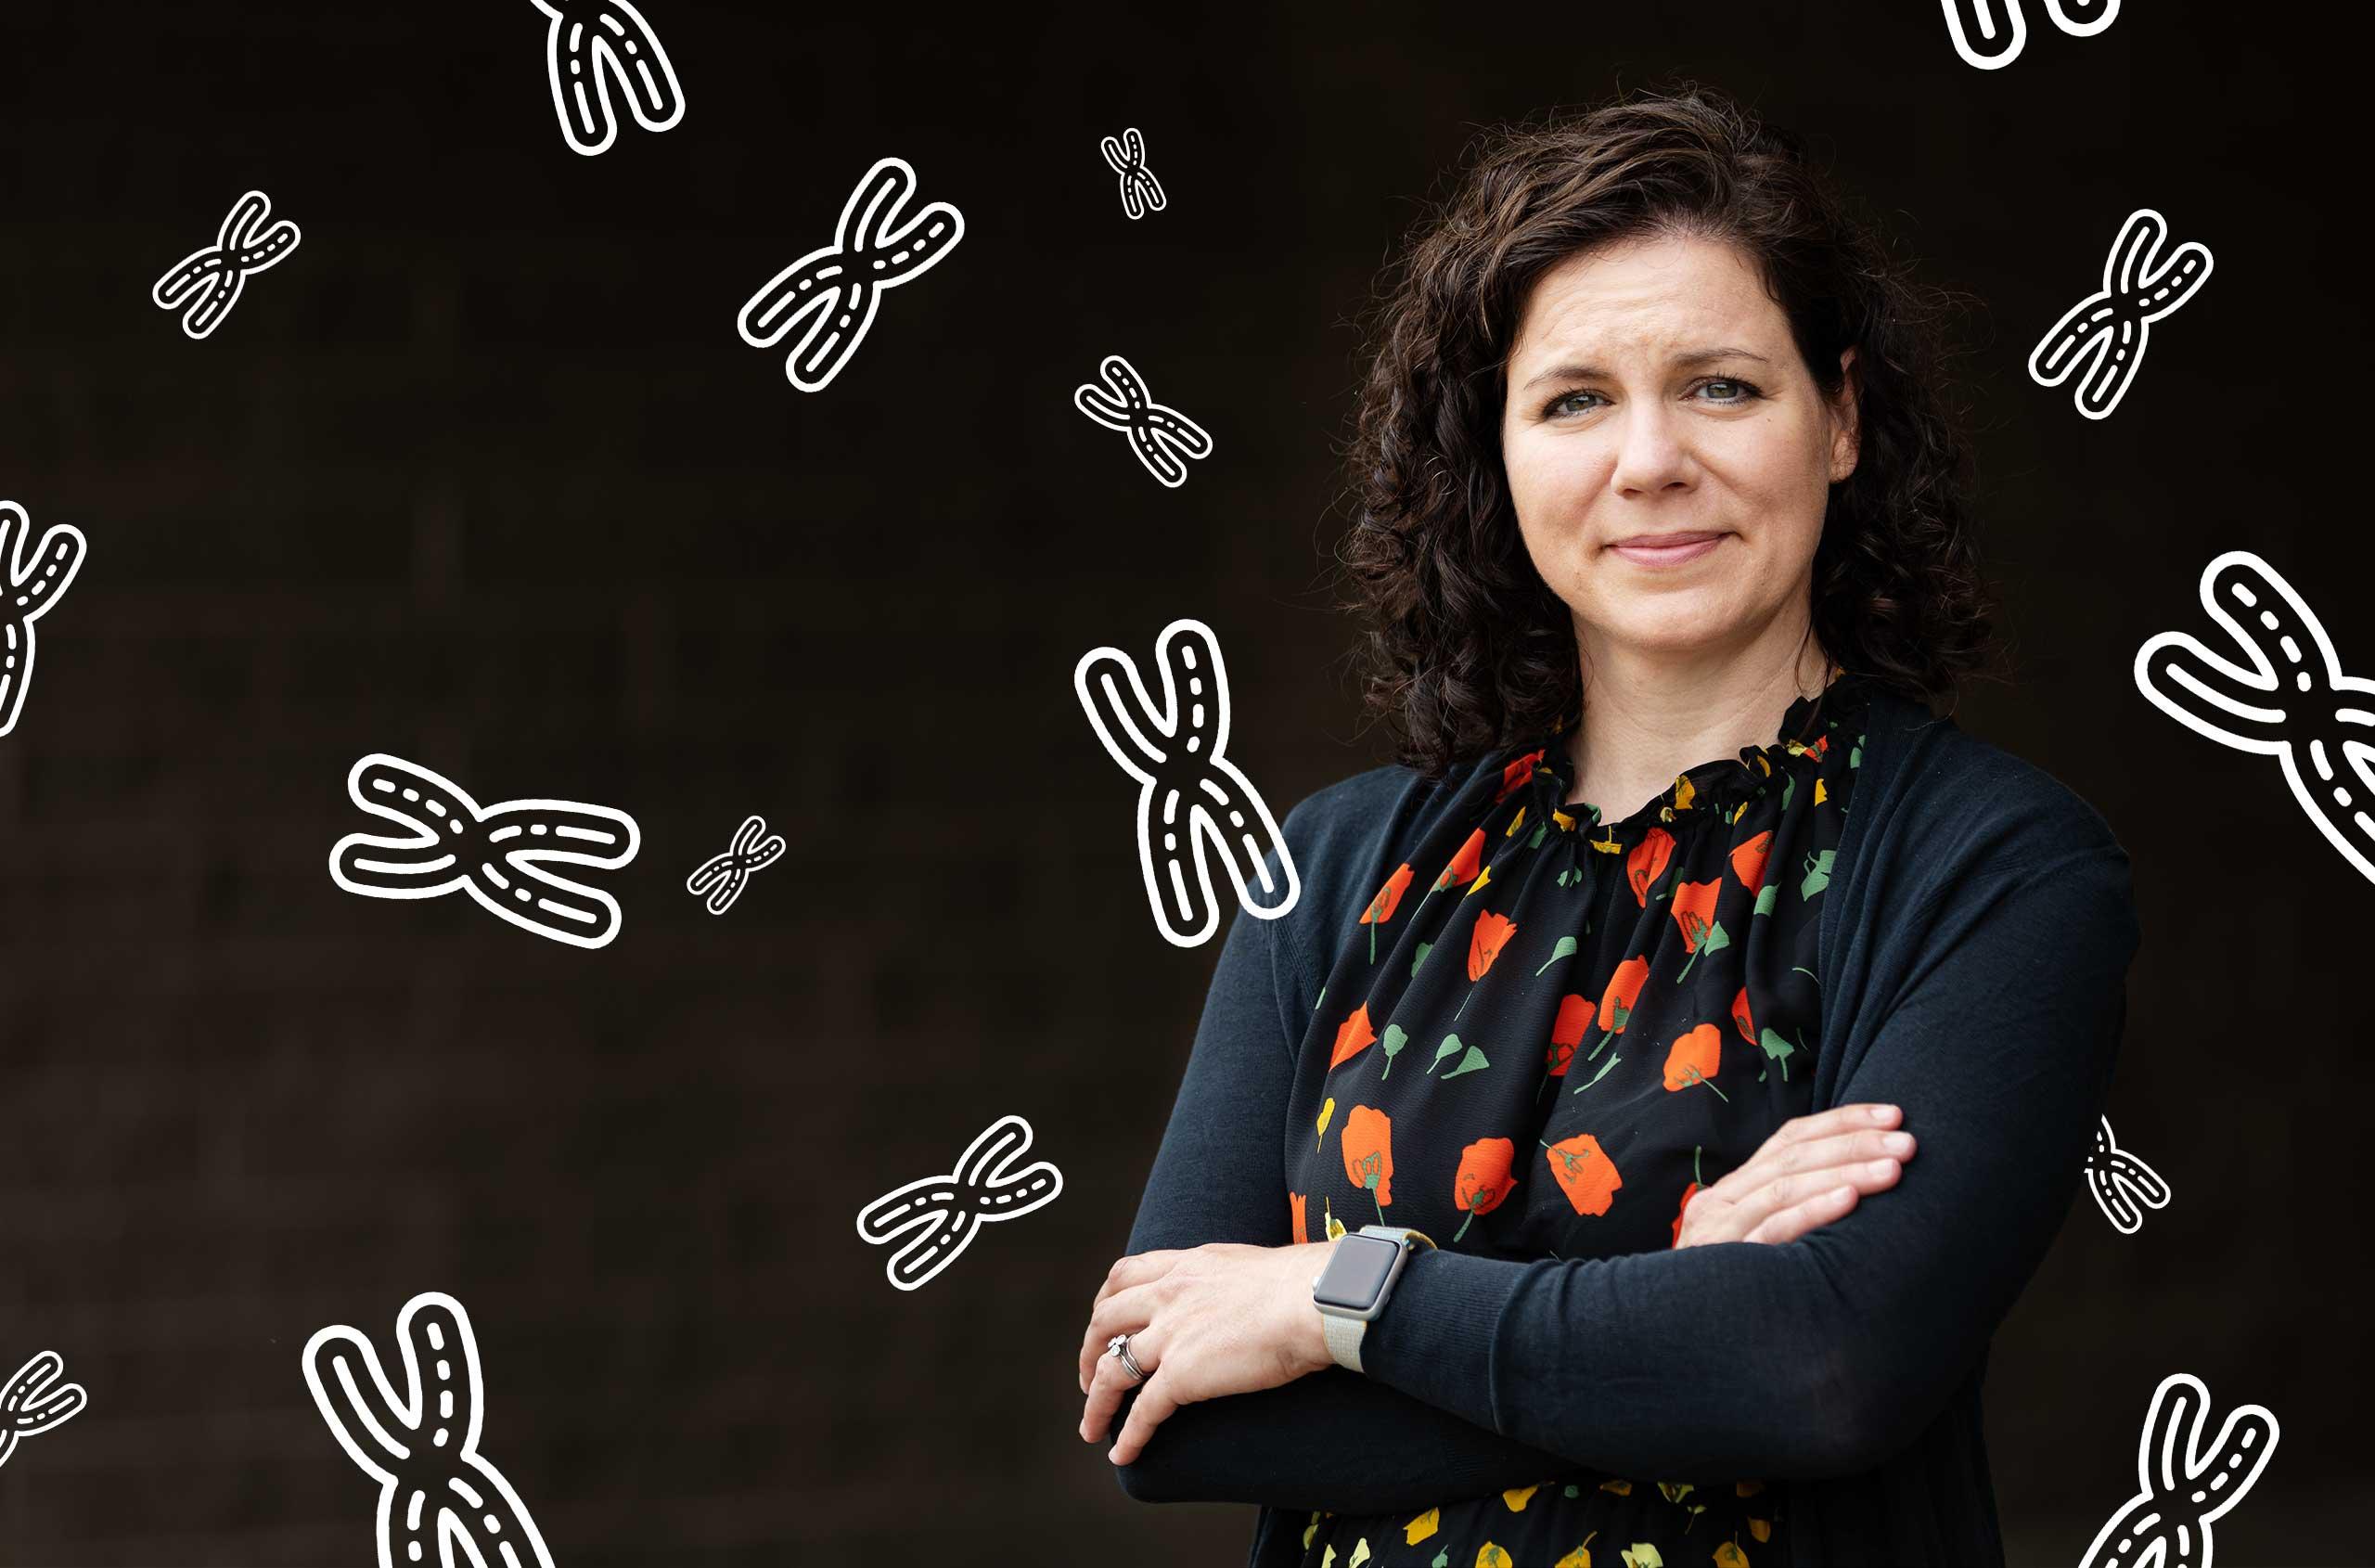 Photo of Karen Miga of the University of California, Santa Cruz, with a representation of chromosomes in the background.